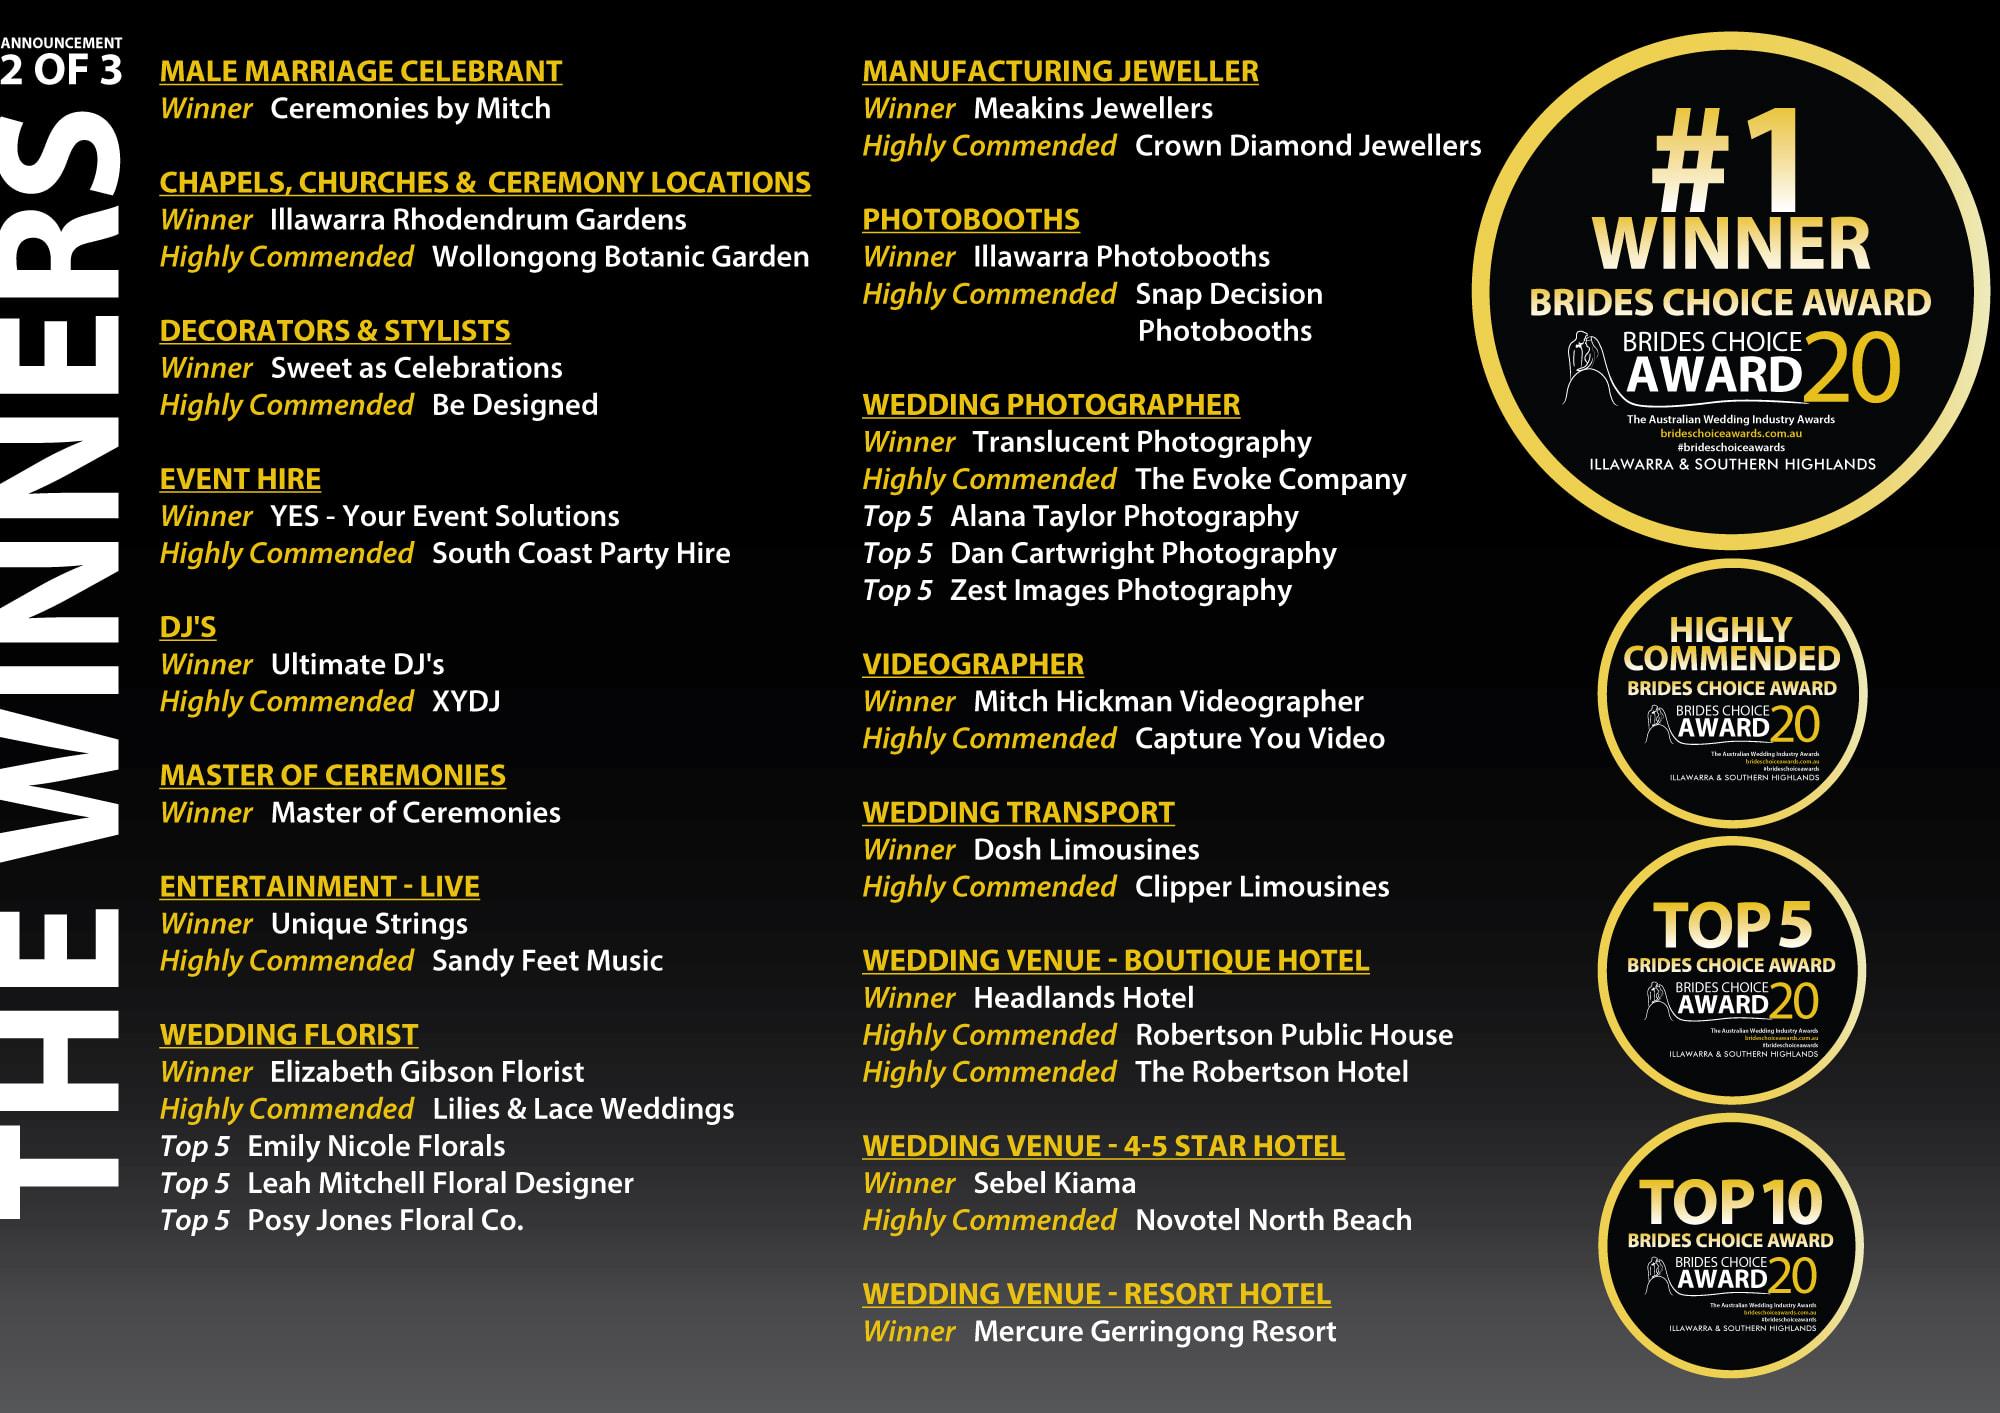 Illawarra & Southern Highlands Brides Choice Awards 2020